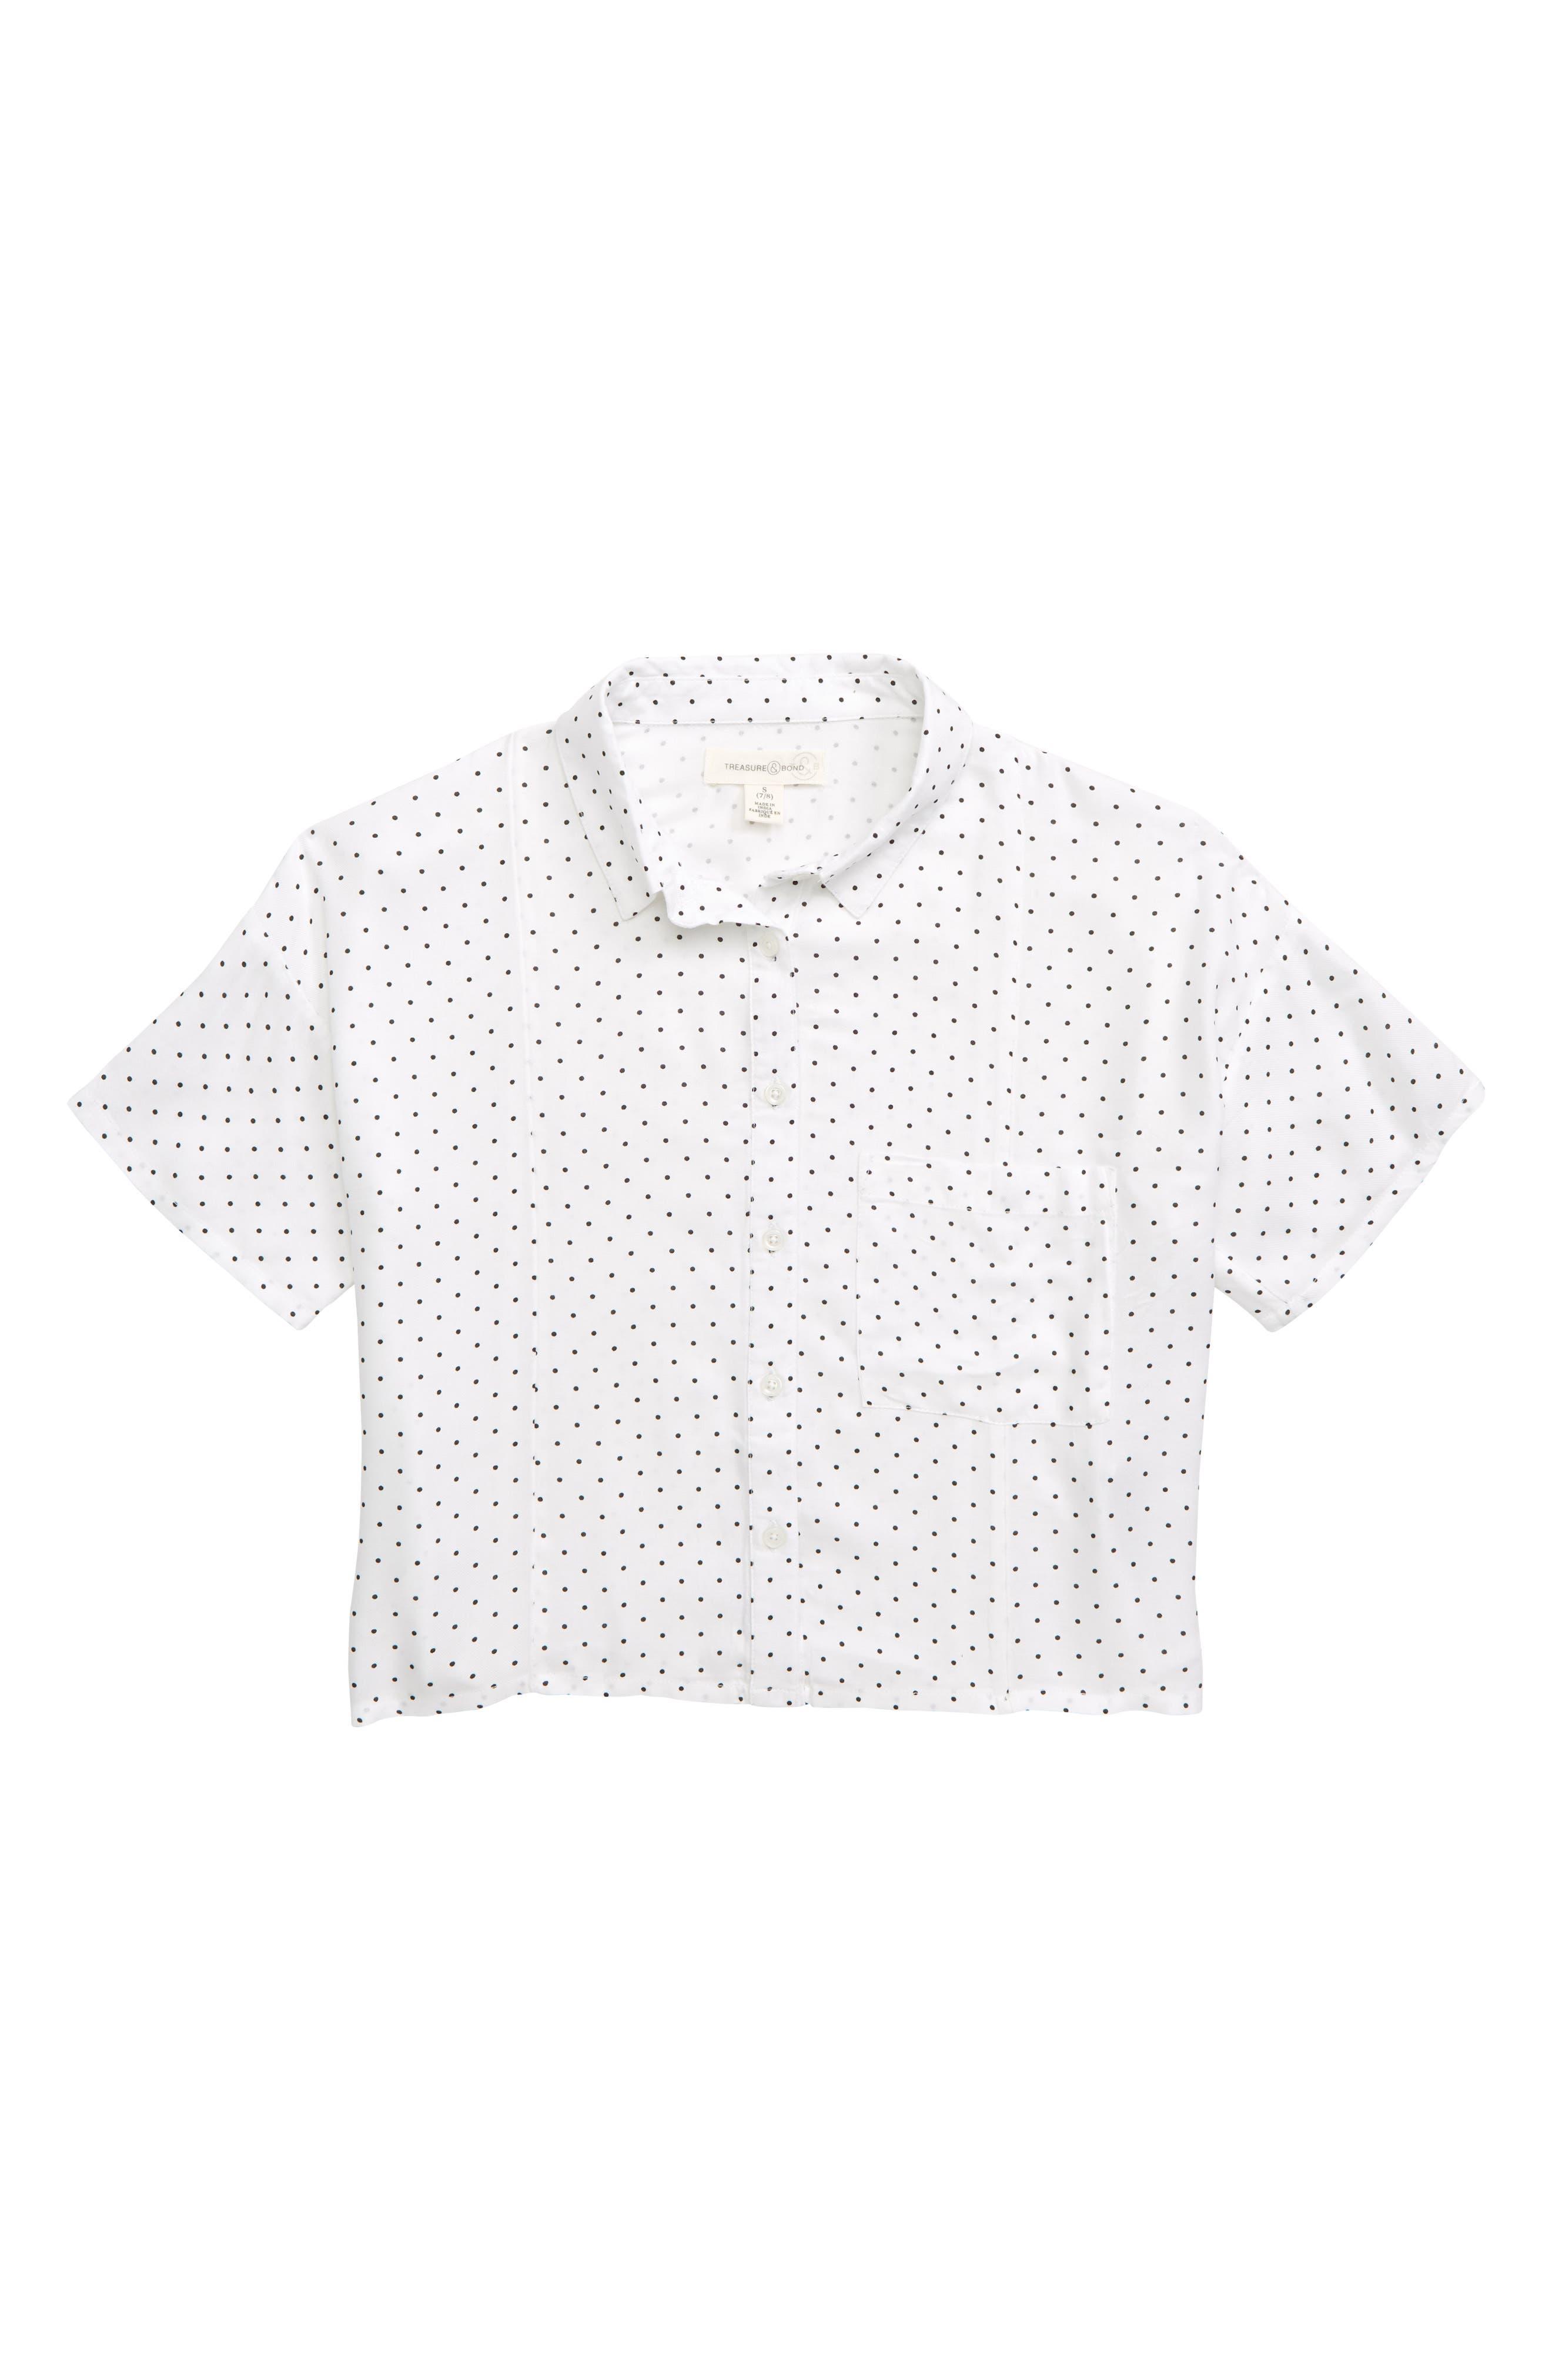 TREASURE & BOND Boxy Polka Dot Shirt, Main, color, WHITE- BLACK DOT